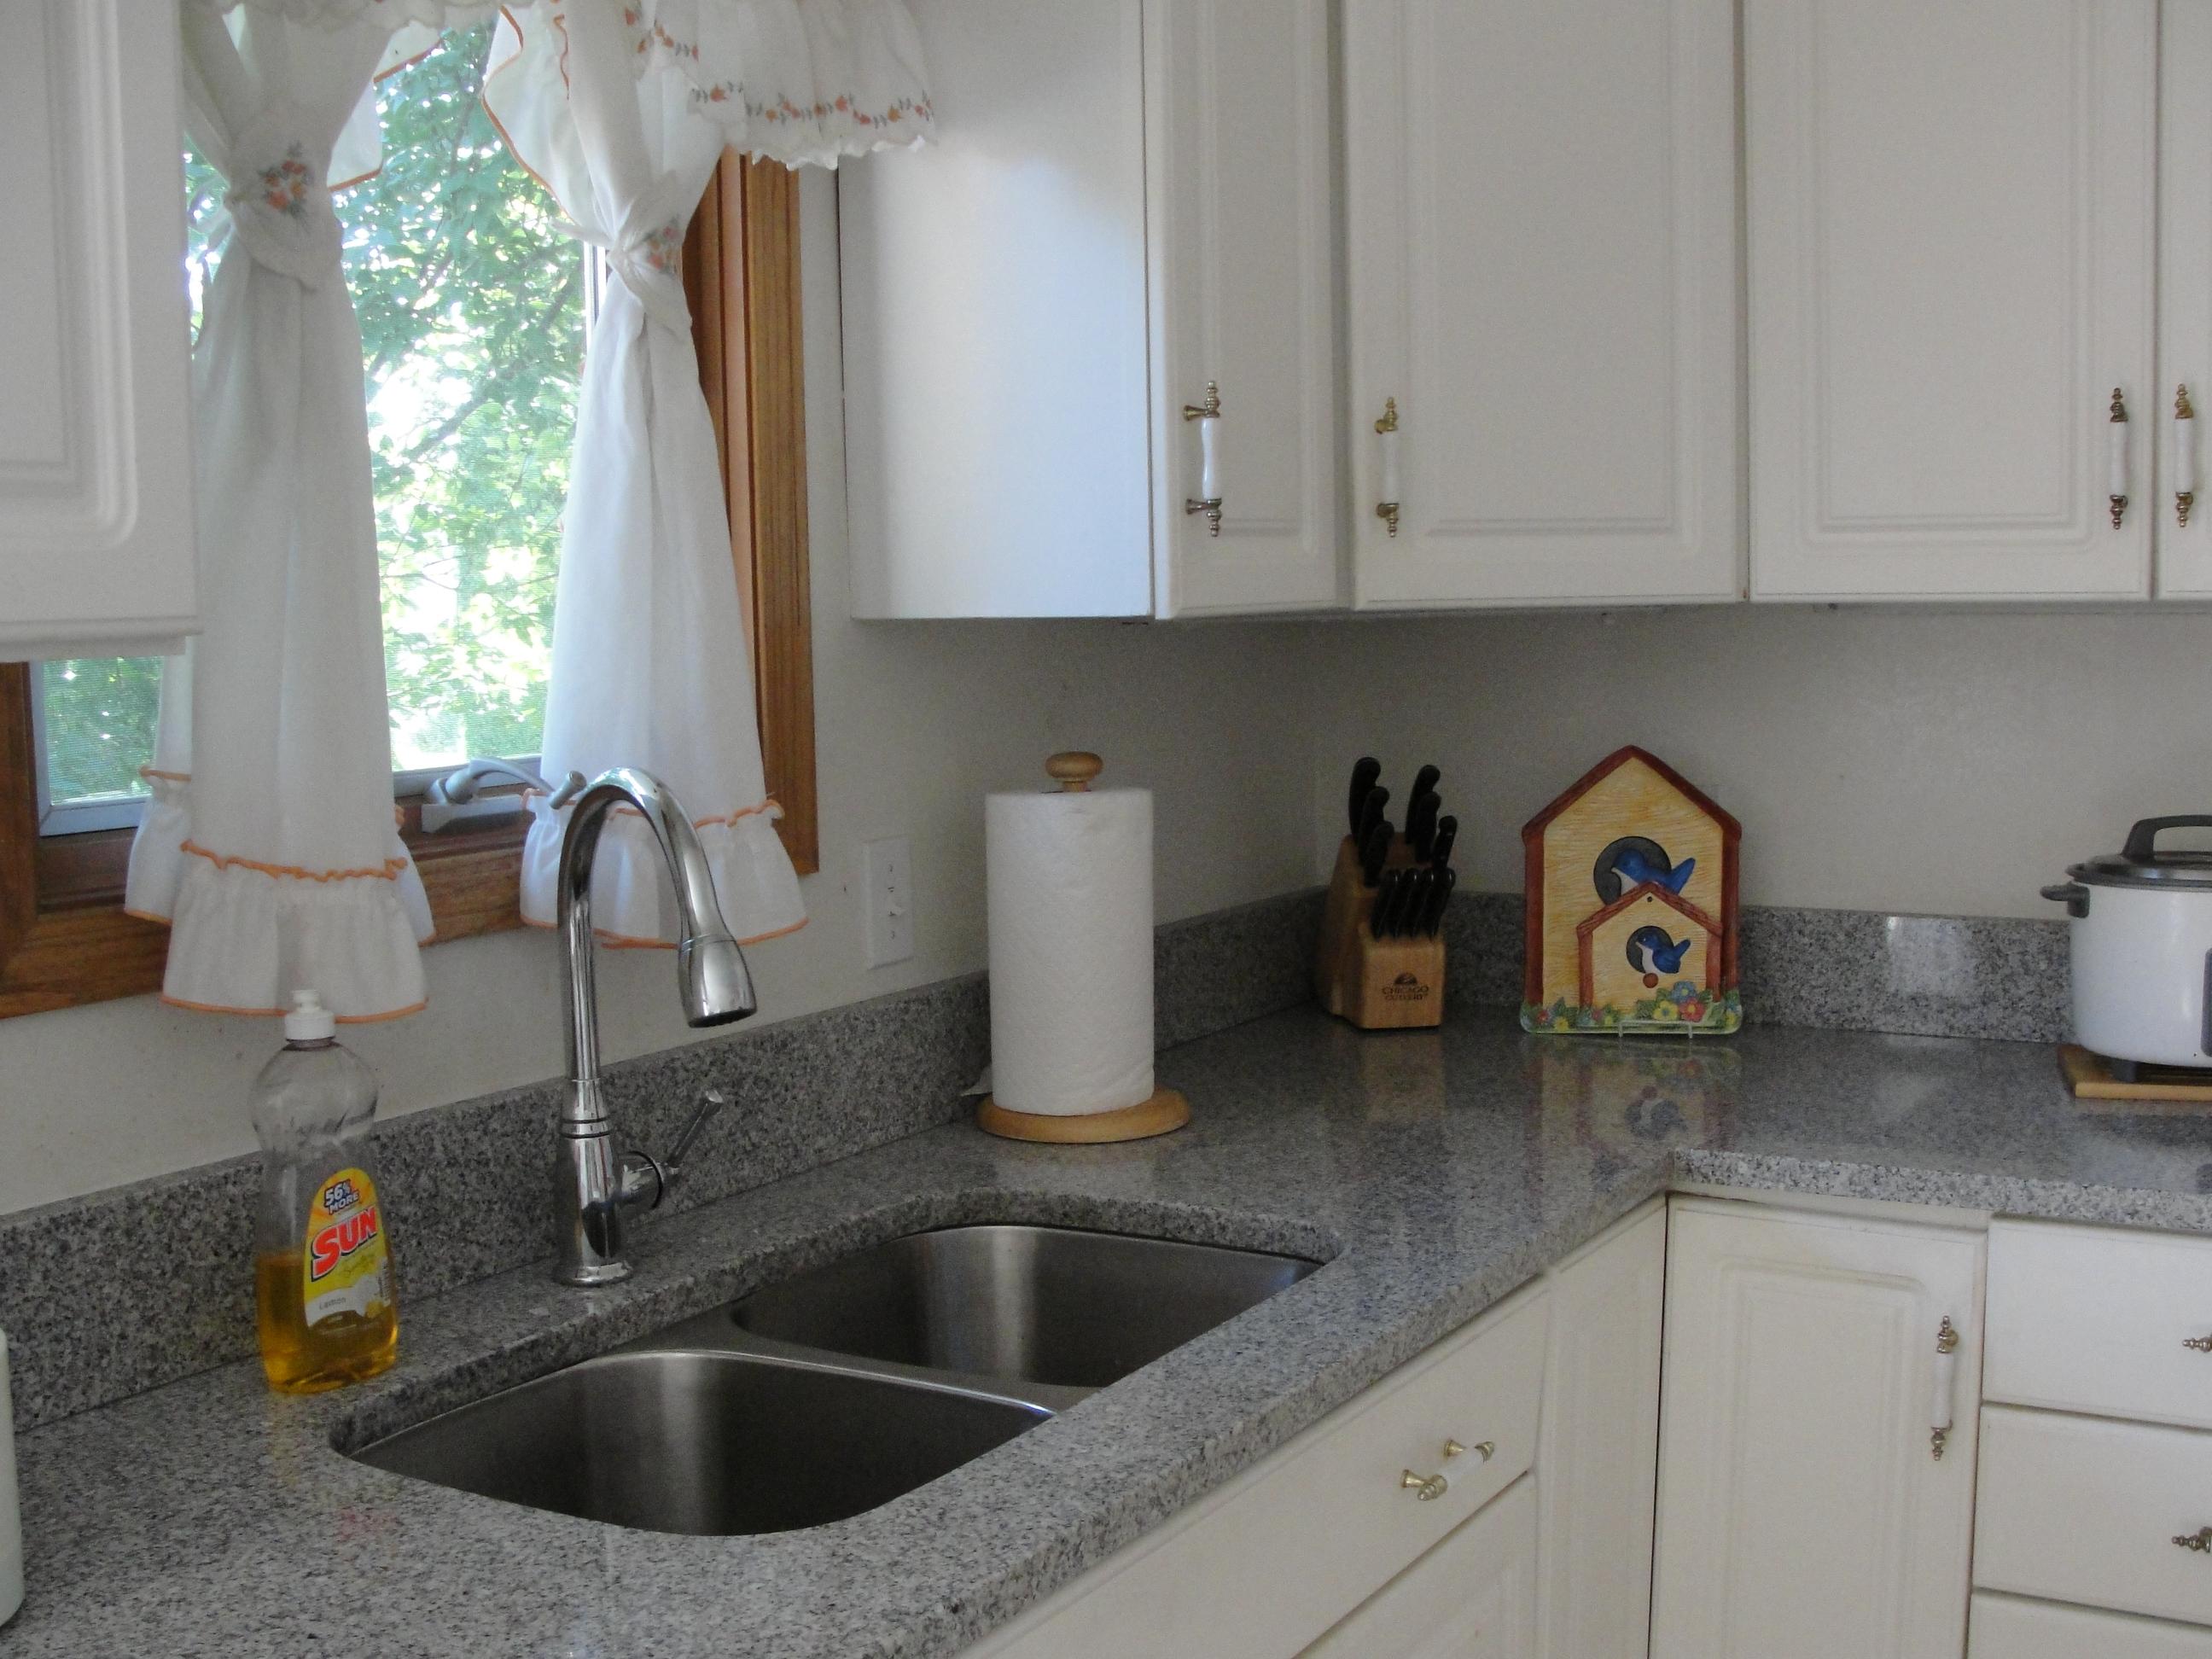 lowes kitchen cabinets rachael ray 小厨房旧貌换新颜 还在进行时 南方朱槿的网上家园 after3